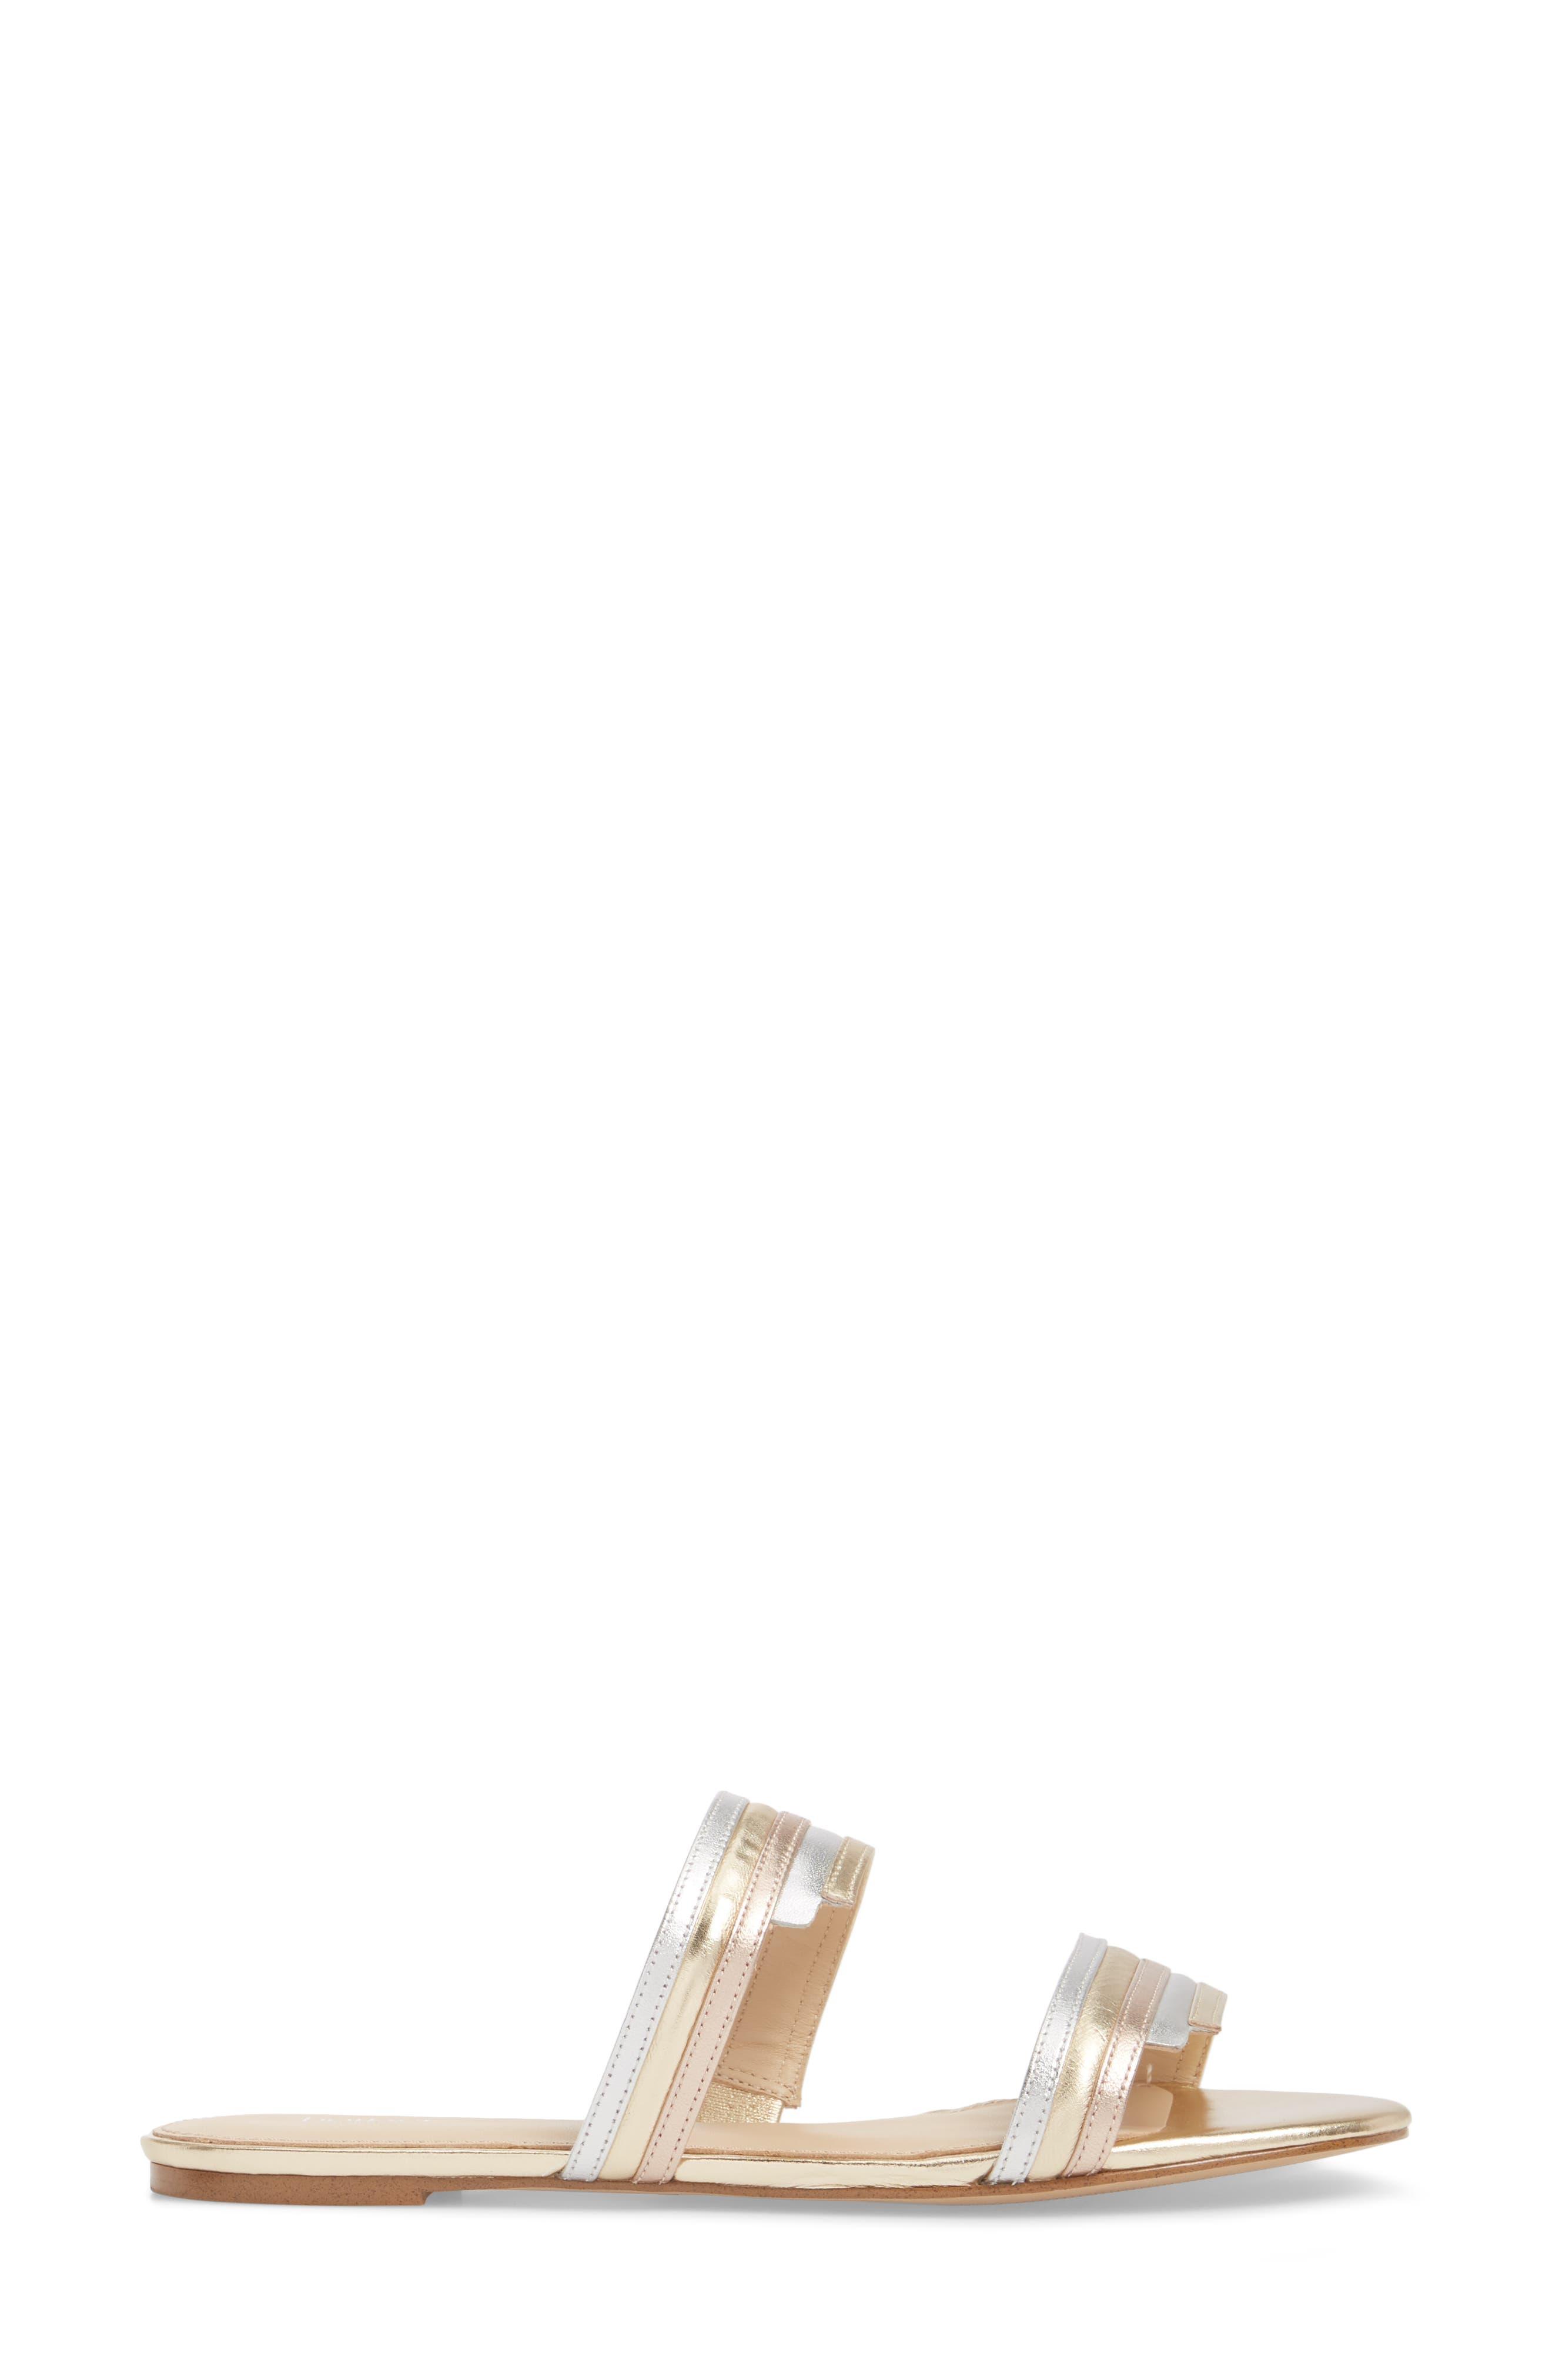 Maise Slide Sandal,                             Alternate thumbnail 3, color,                             Ivory Multi Leather